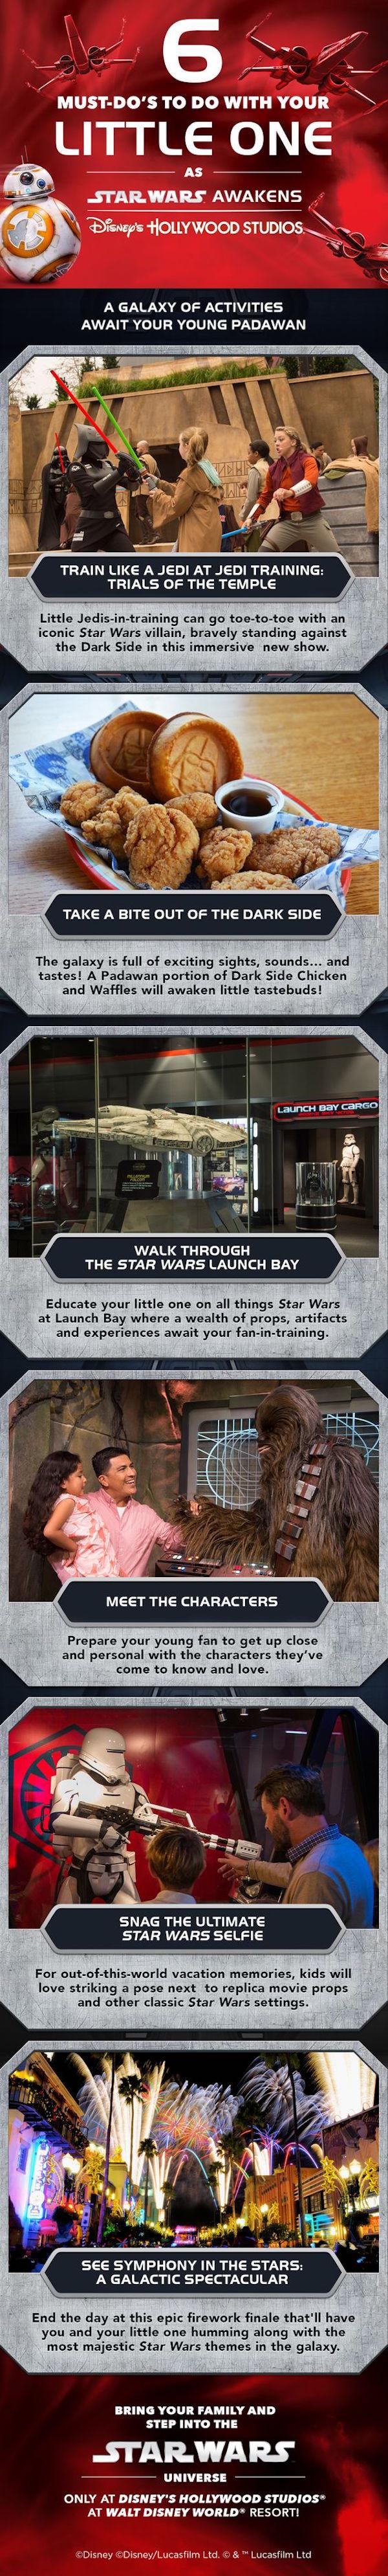 Star Wars Fun For Little Ones This Summer at Walt Disney World Resort